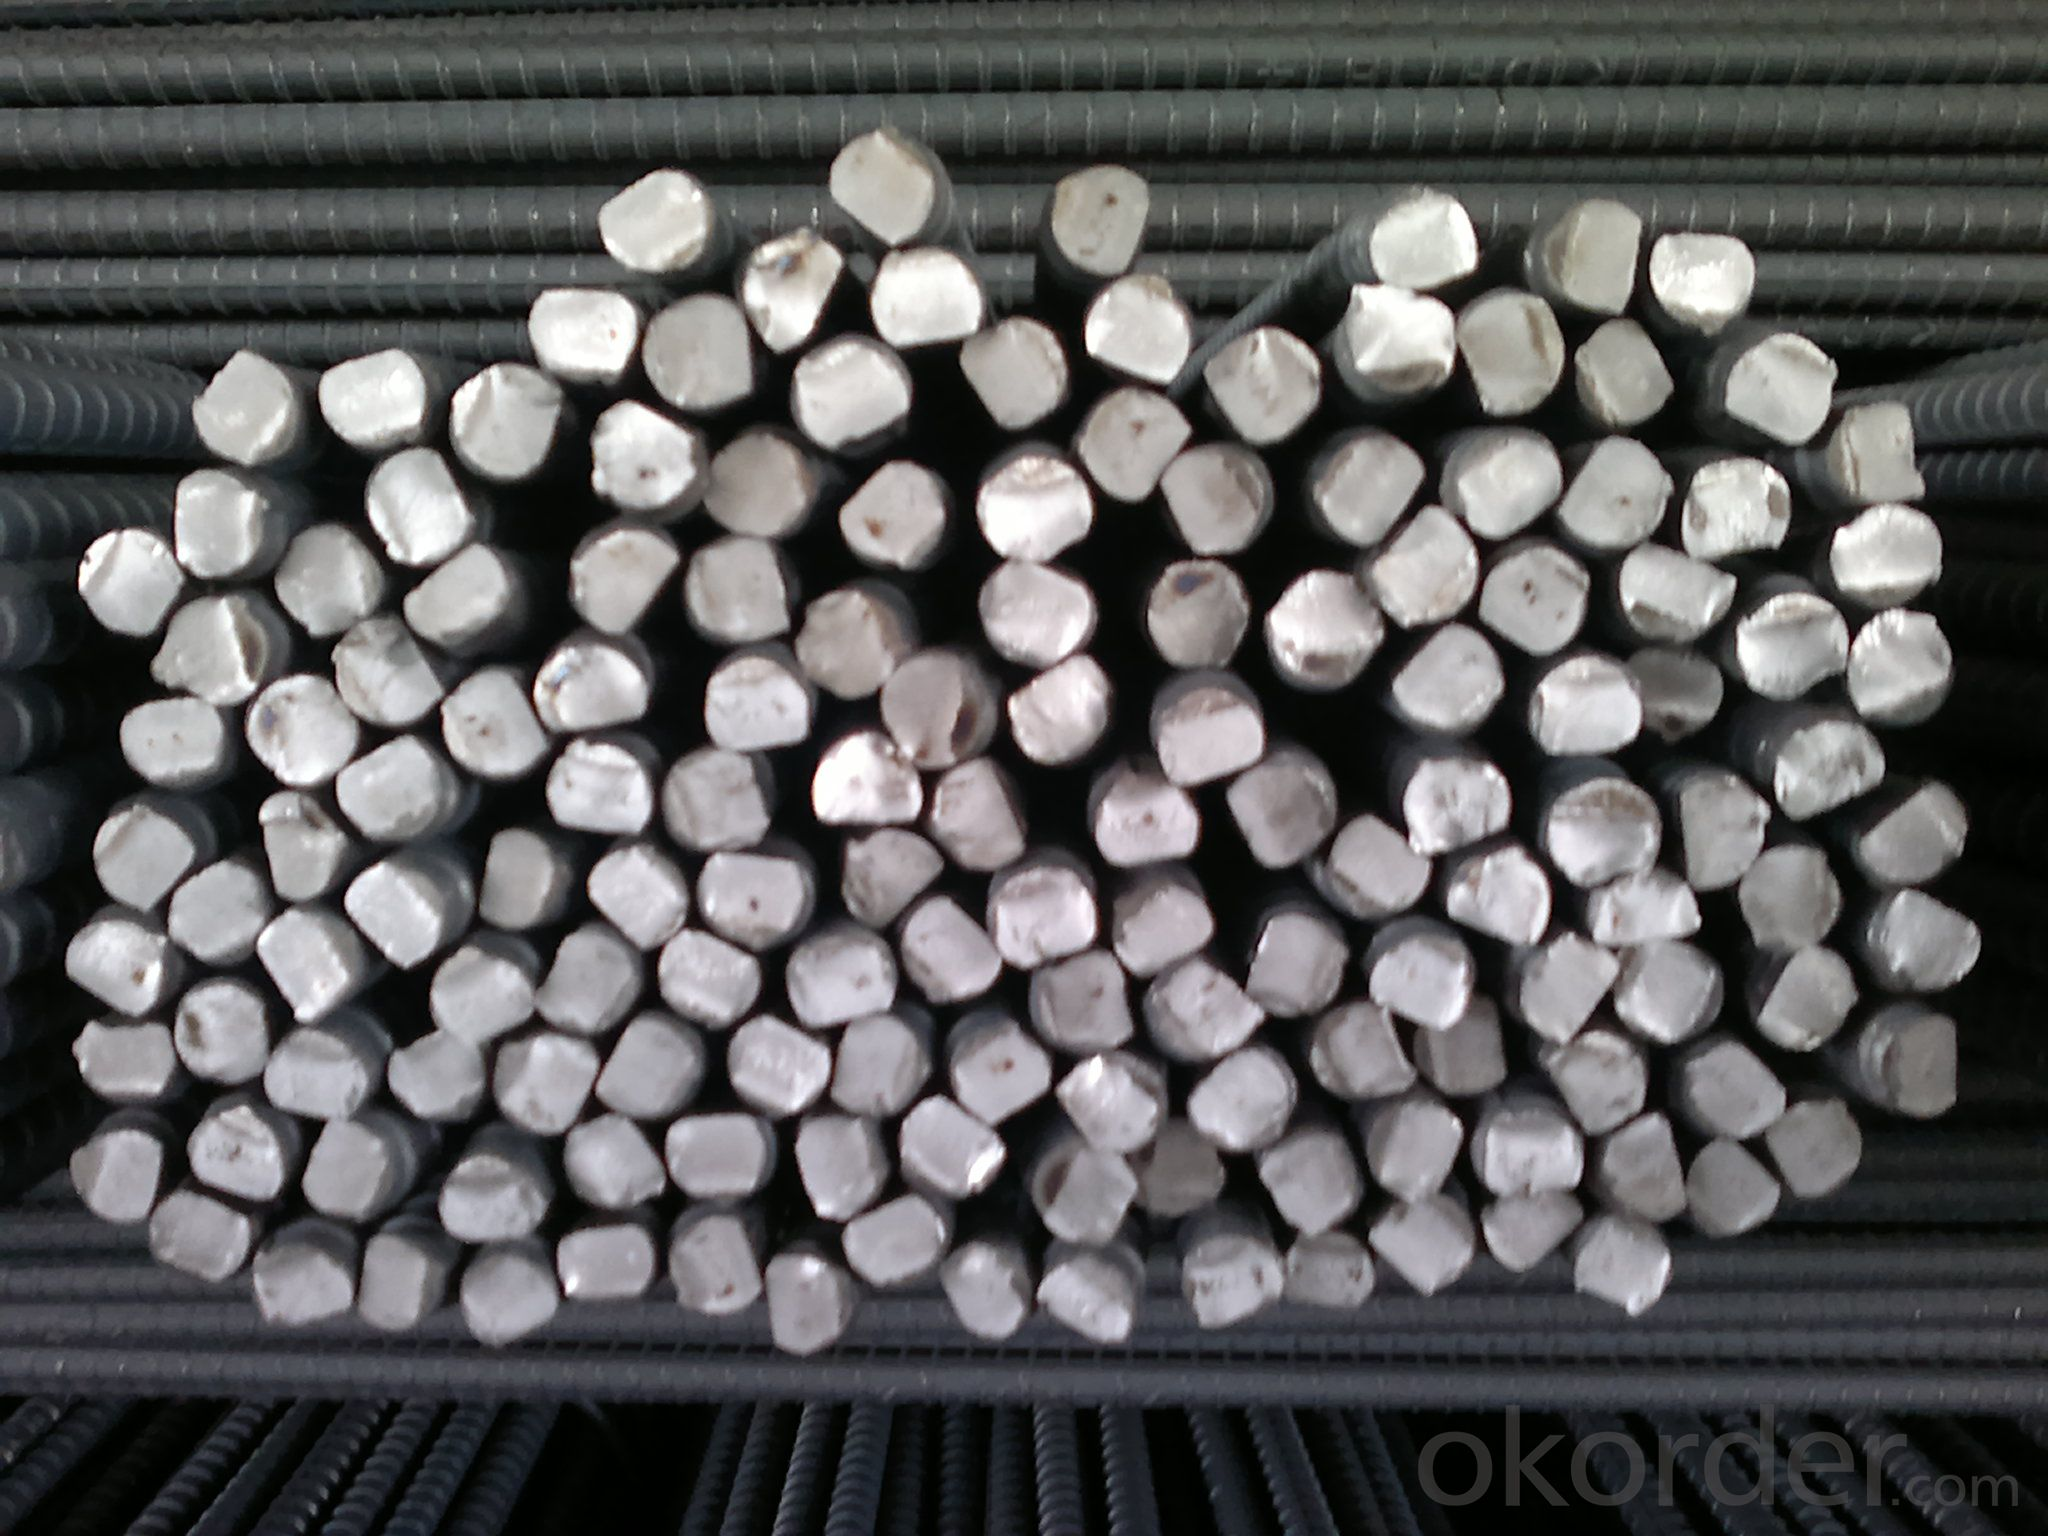 GB Standard HRB400, 500 Hot Rolled Deformed Steel Rebars